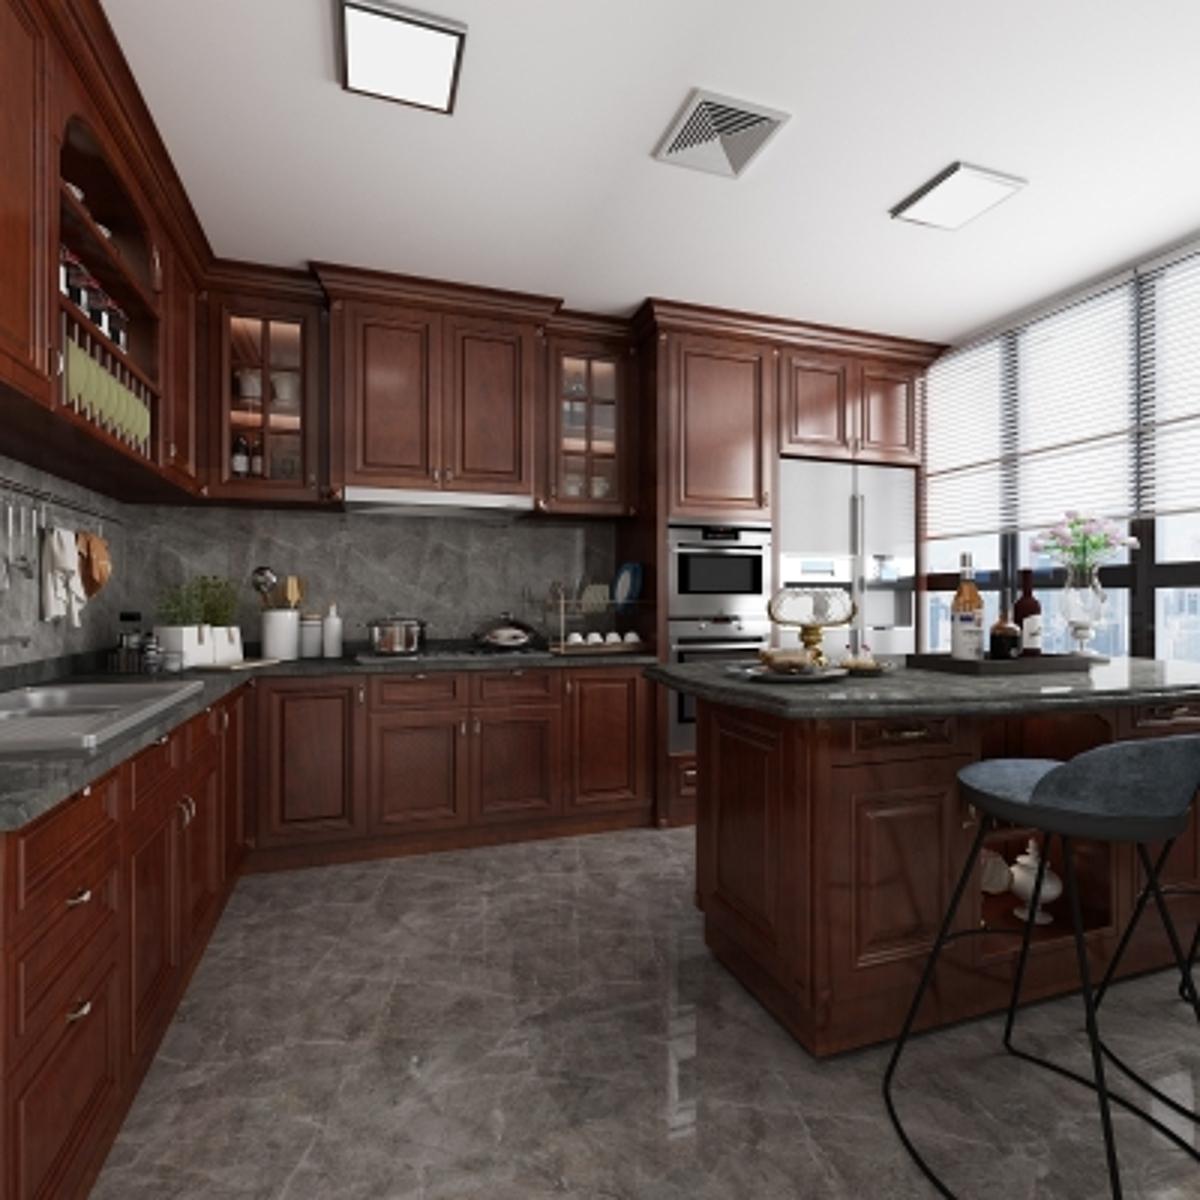 cg228美式厨房橱柜模型